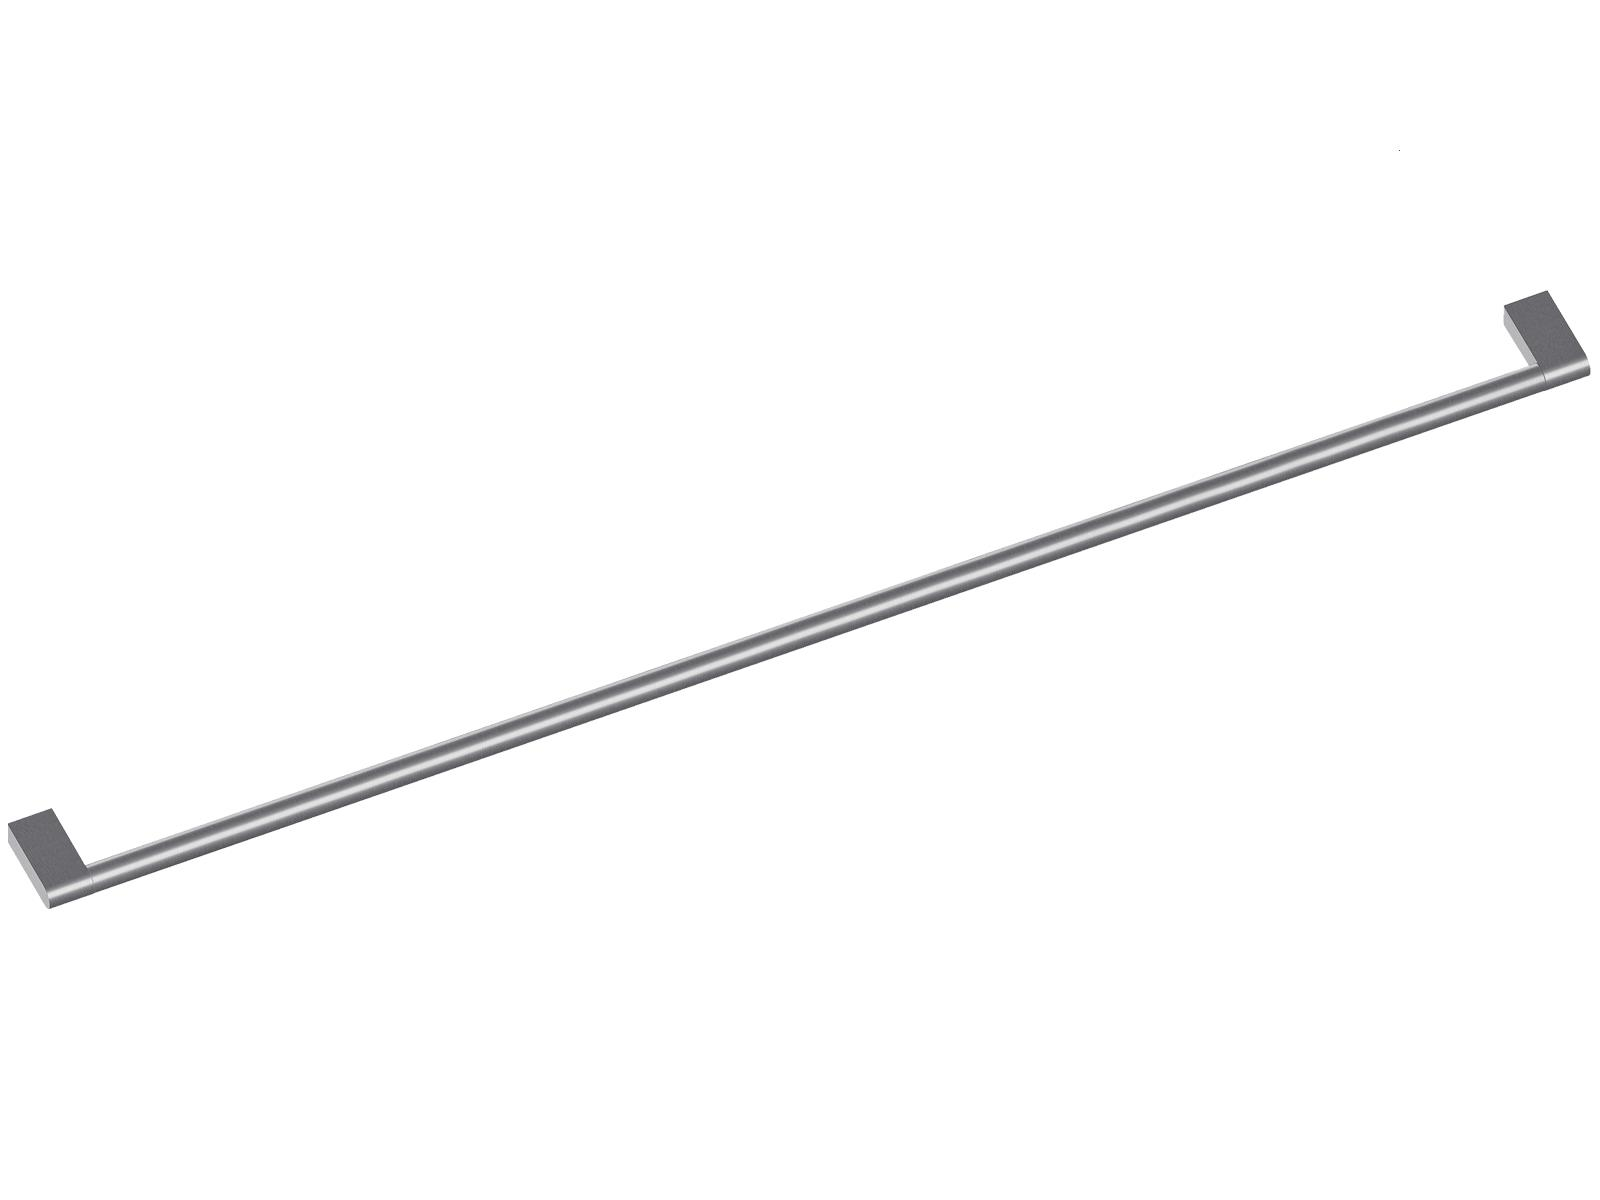 Gaggenau RA 425 910 Möbelgriff Edelstahl 810 mm